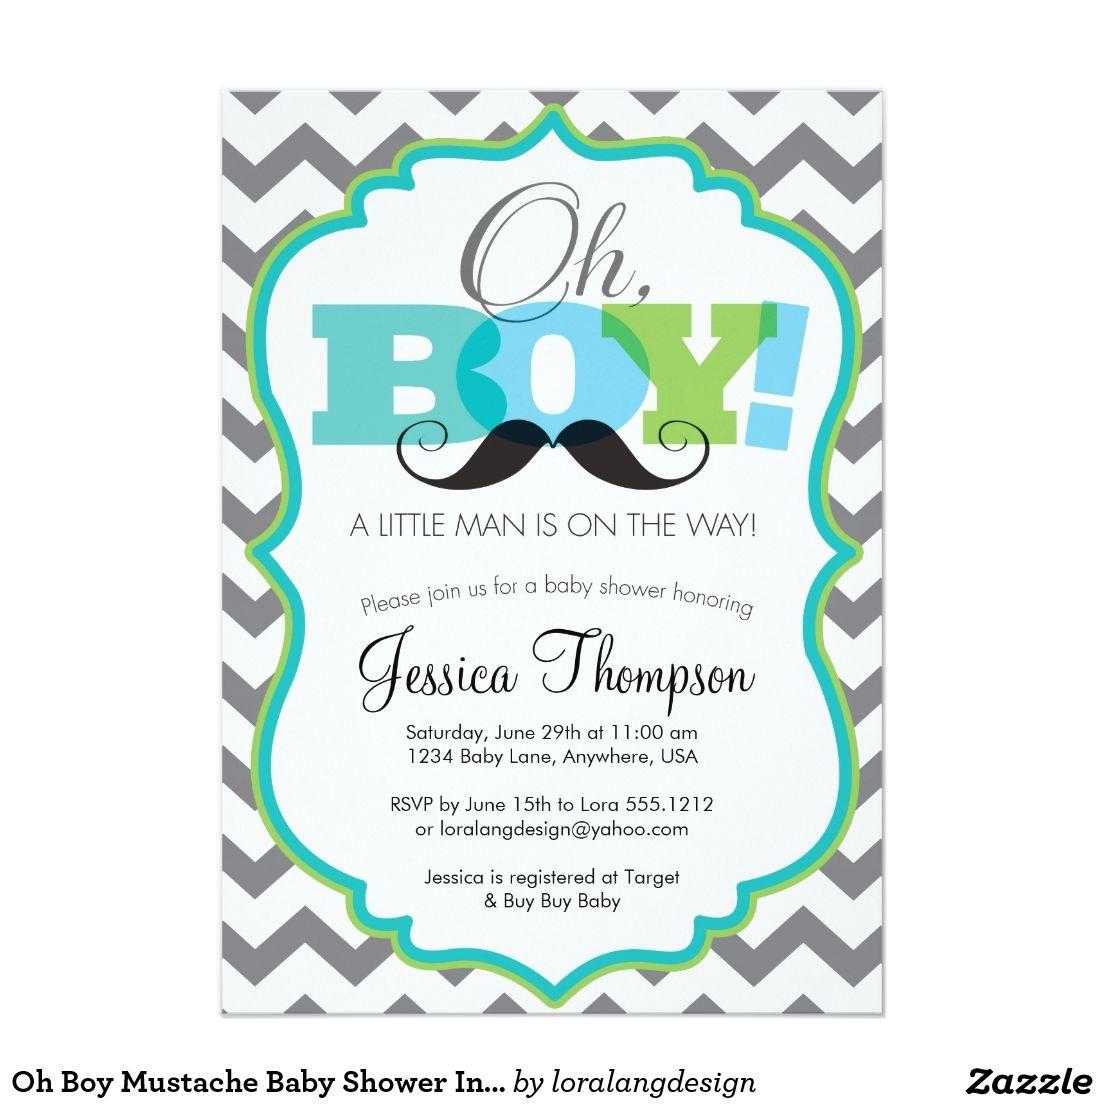 Baby Shower Invitations   21st - Bridal World - Wedding Ideas and ...